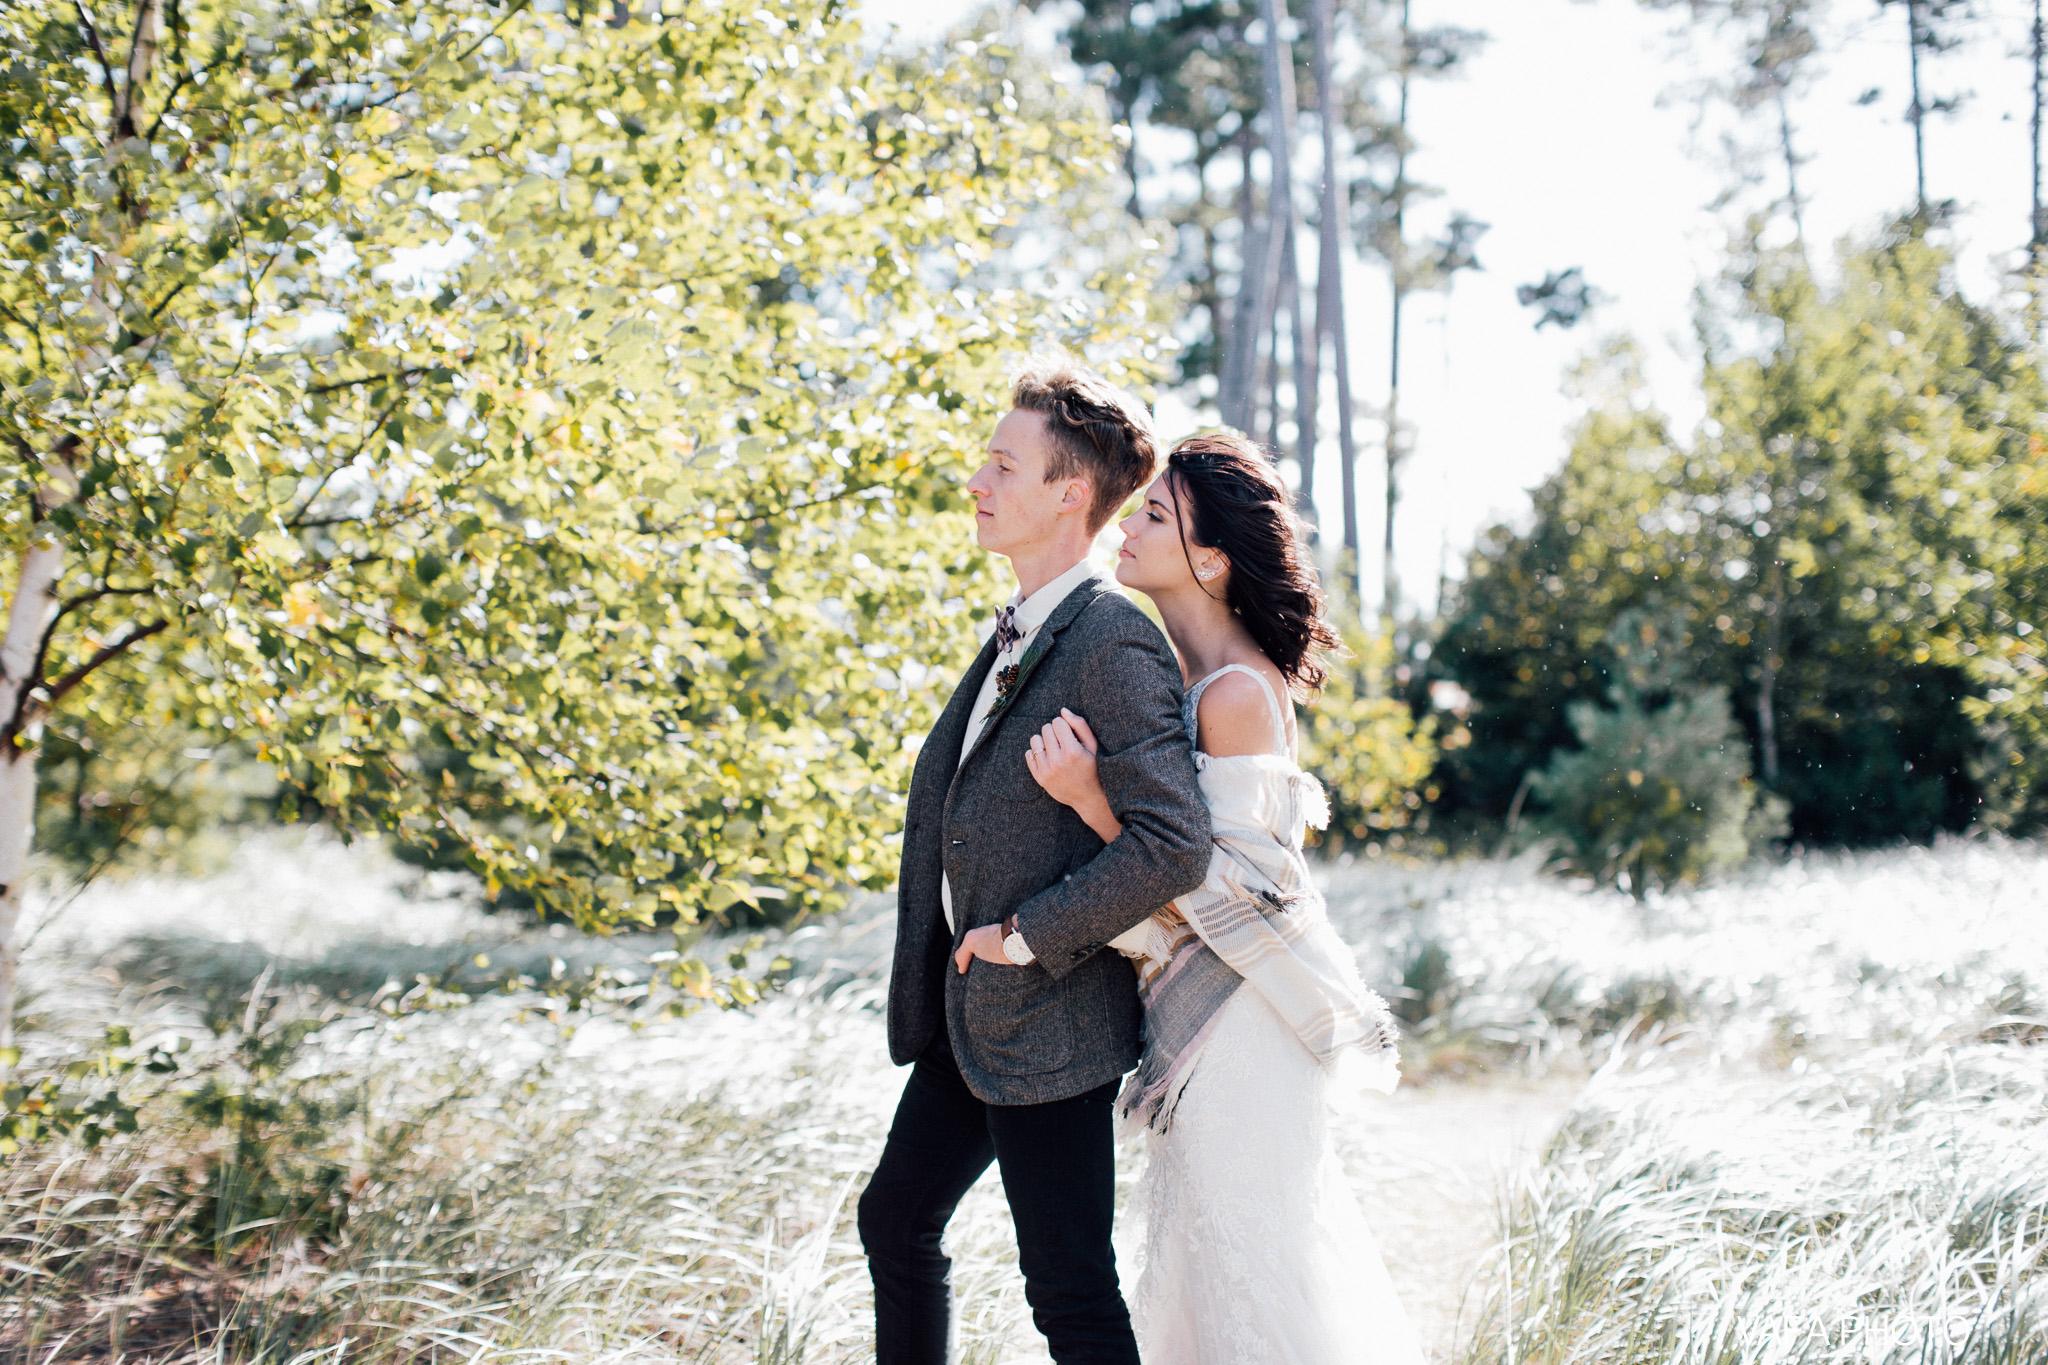 Hogback-Mountain-Wedding-Chelsea-Josh-Vafa-Photo-562.jpg